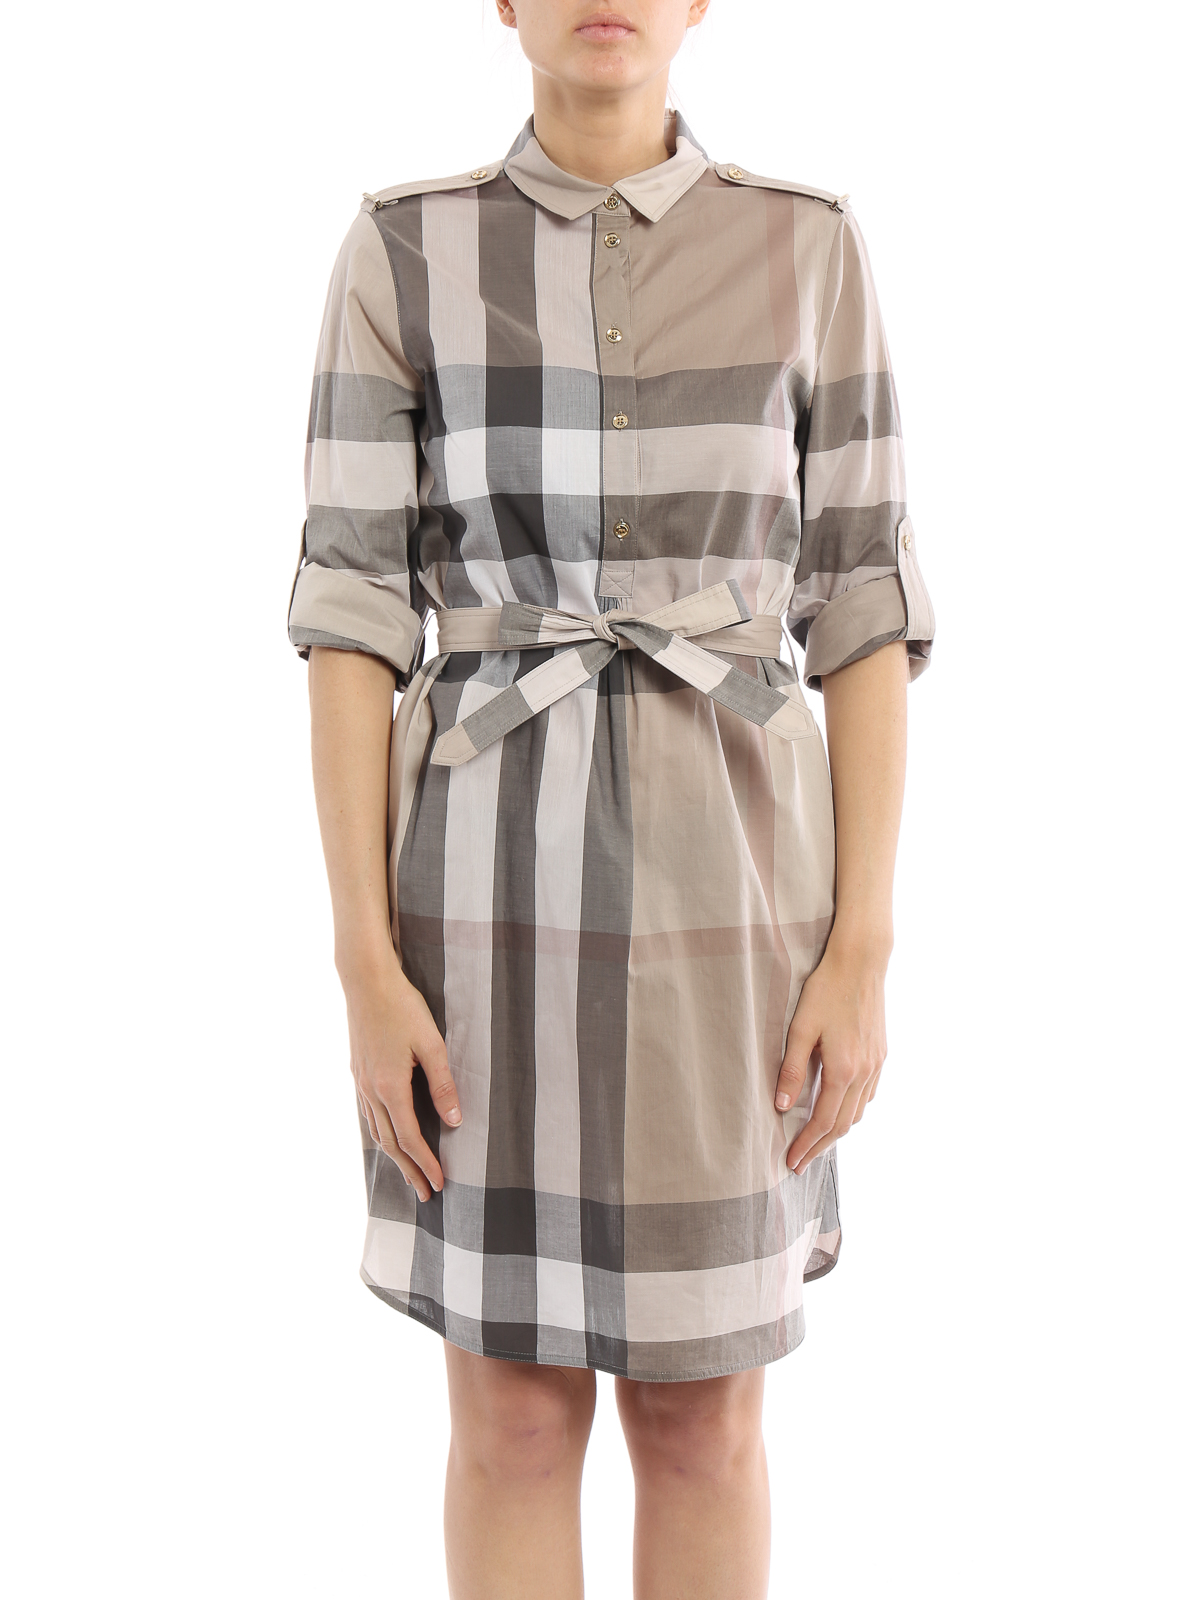 4f71e88883c5 Burberry - Kelsy shirt dress - short dresses - 4025287 1004